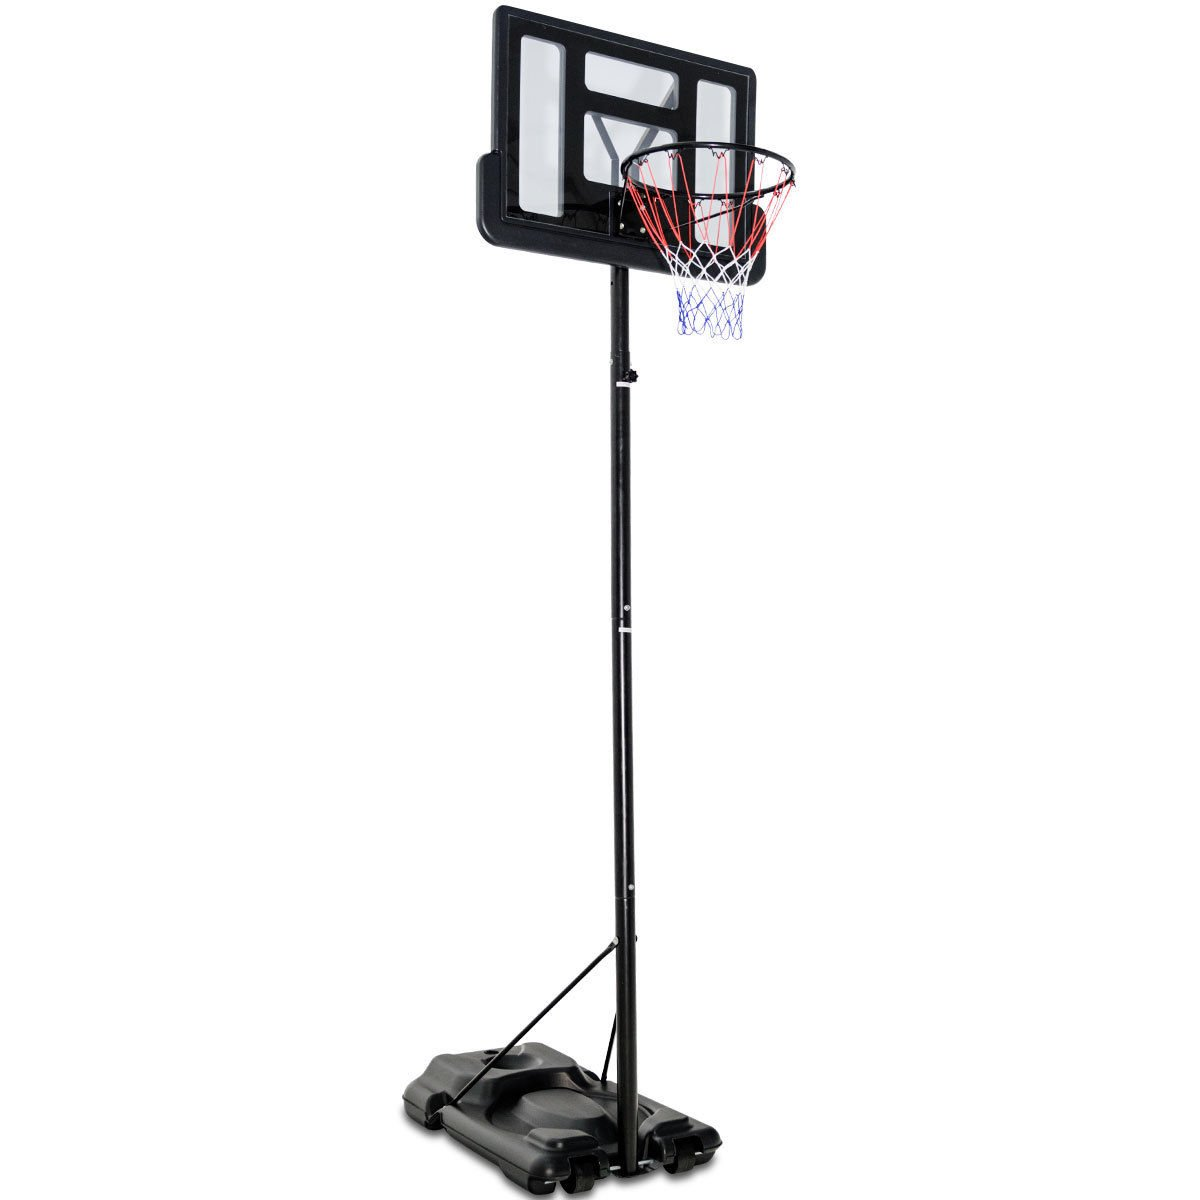 fdinspirationブラックポータブルホイールバスケットボールフープシステムBackboard w /調節可能な高さ8.5 ' to 10 ' with eBook B07FYQWK3K